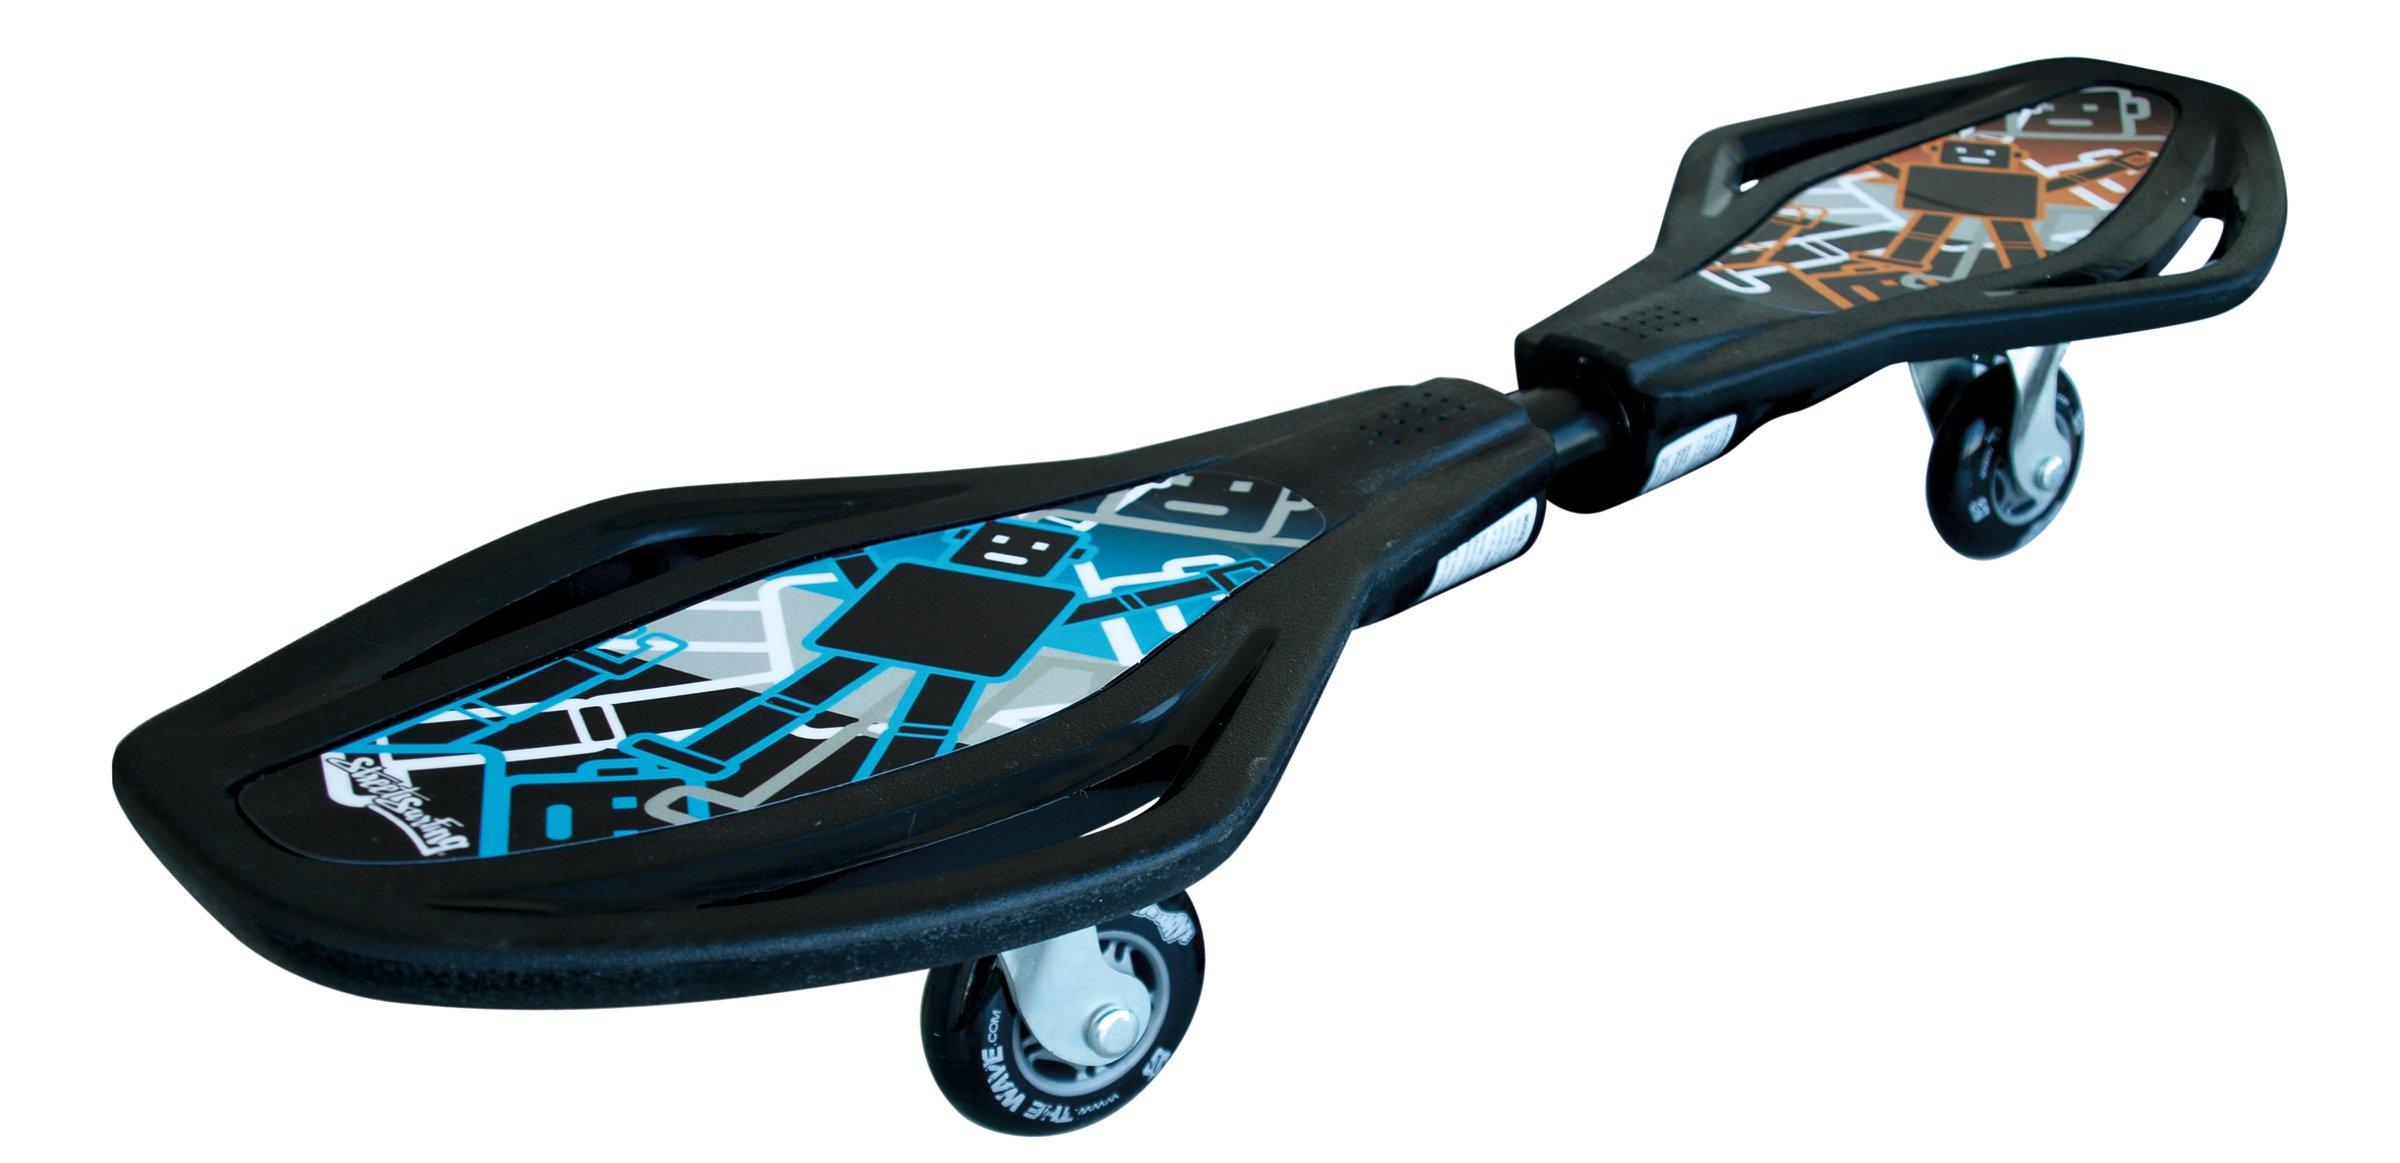 Waveboard skate